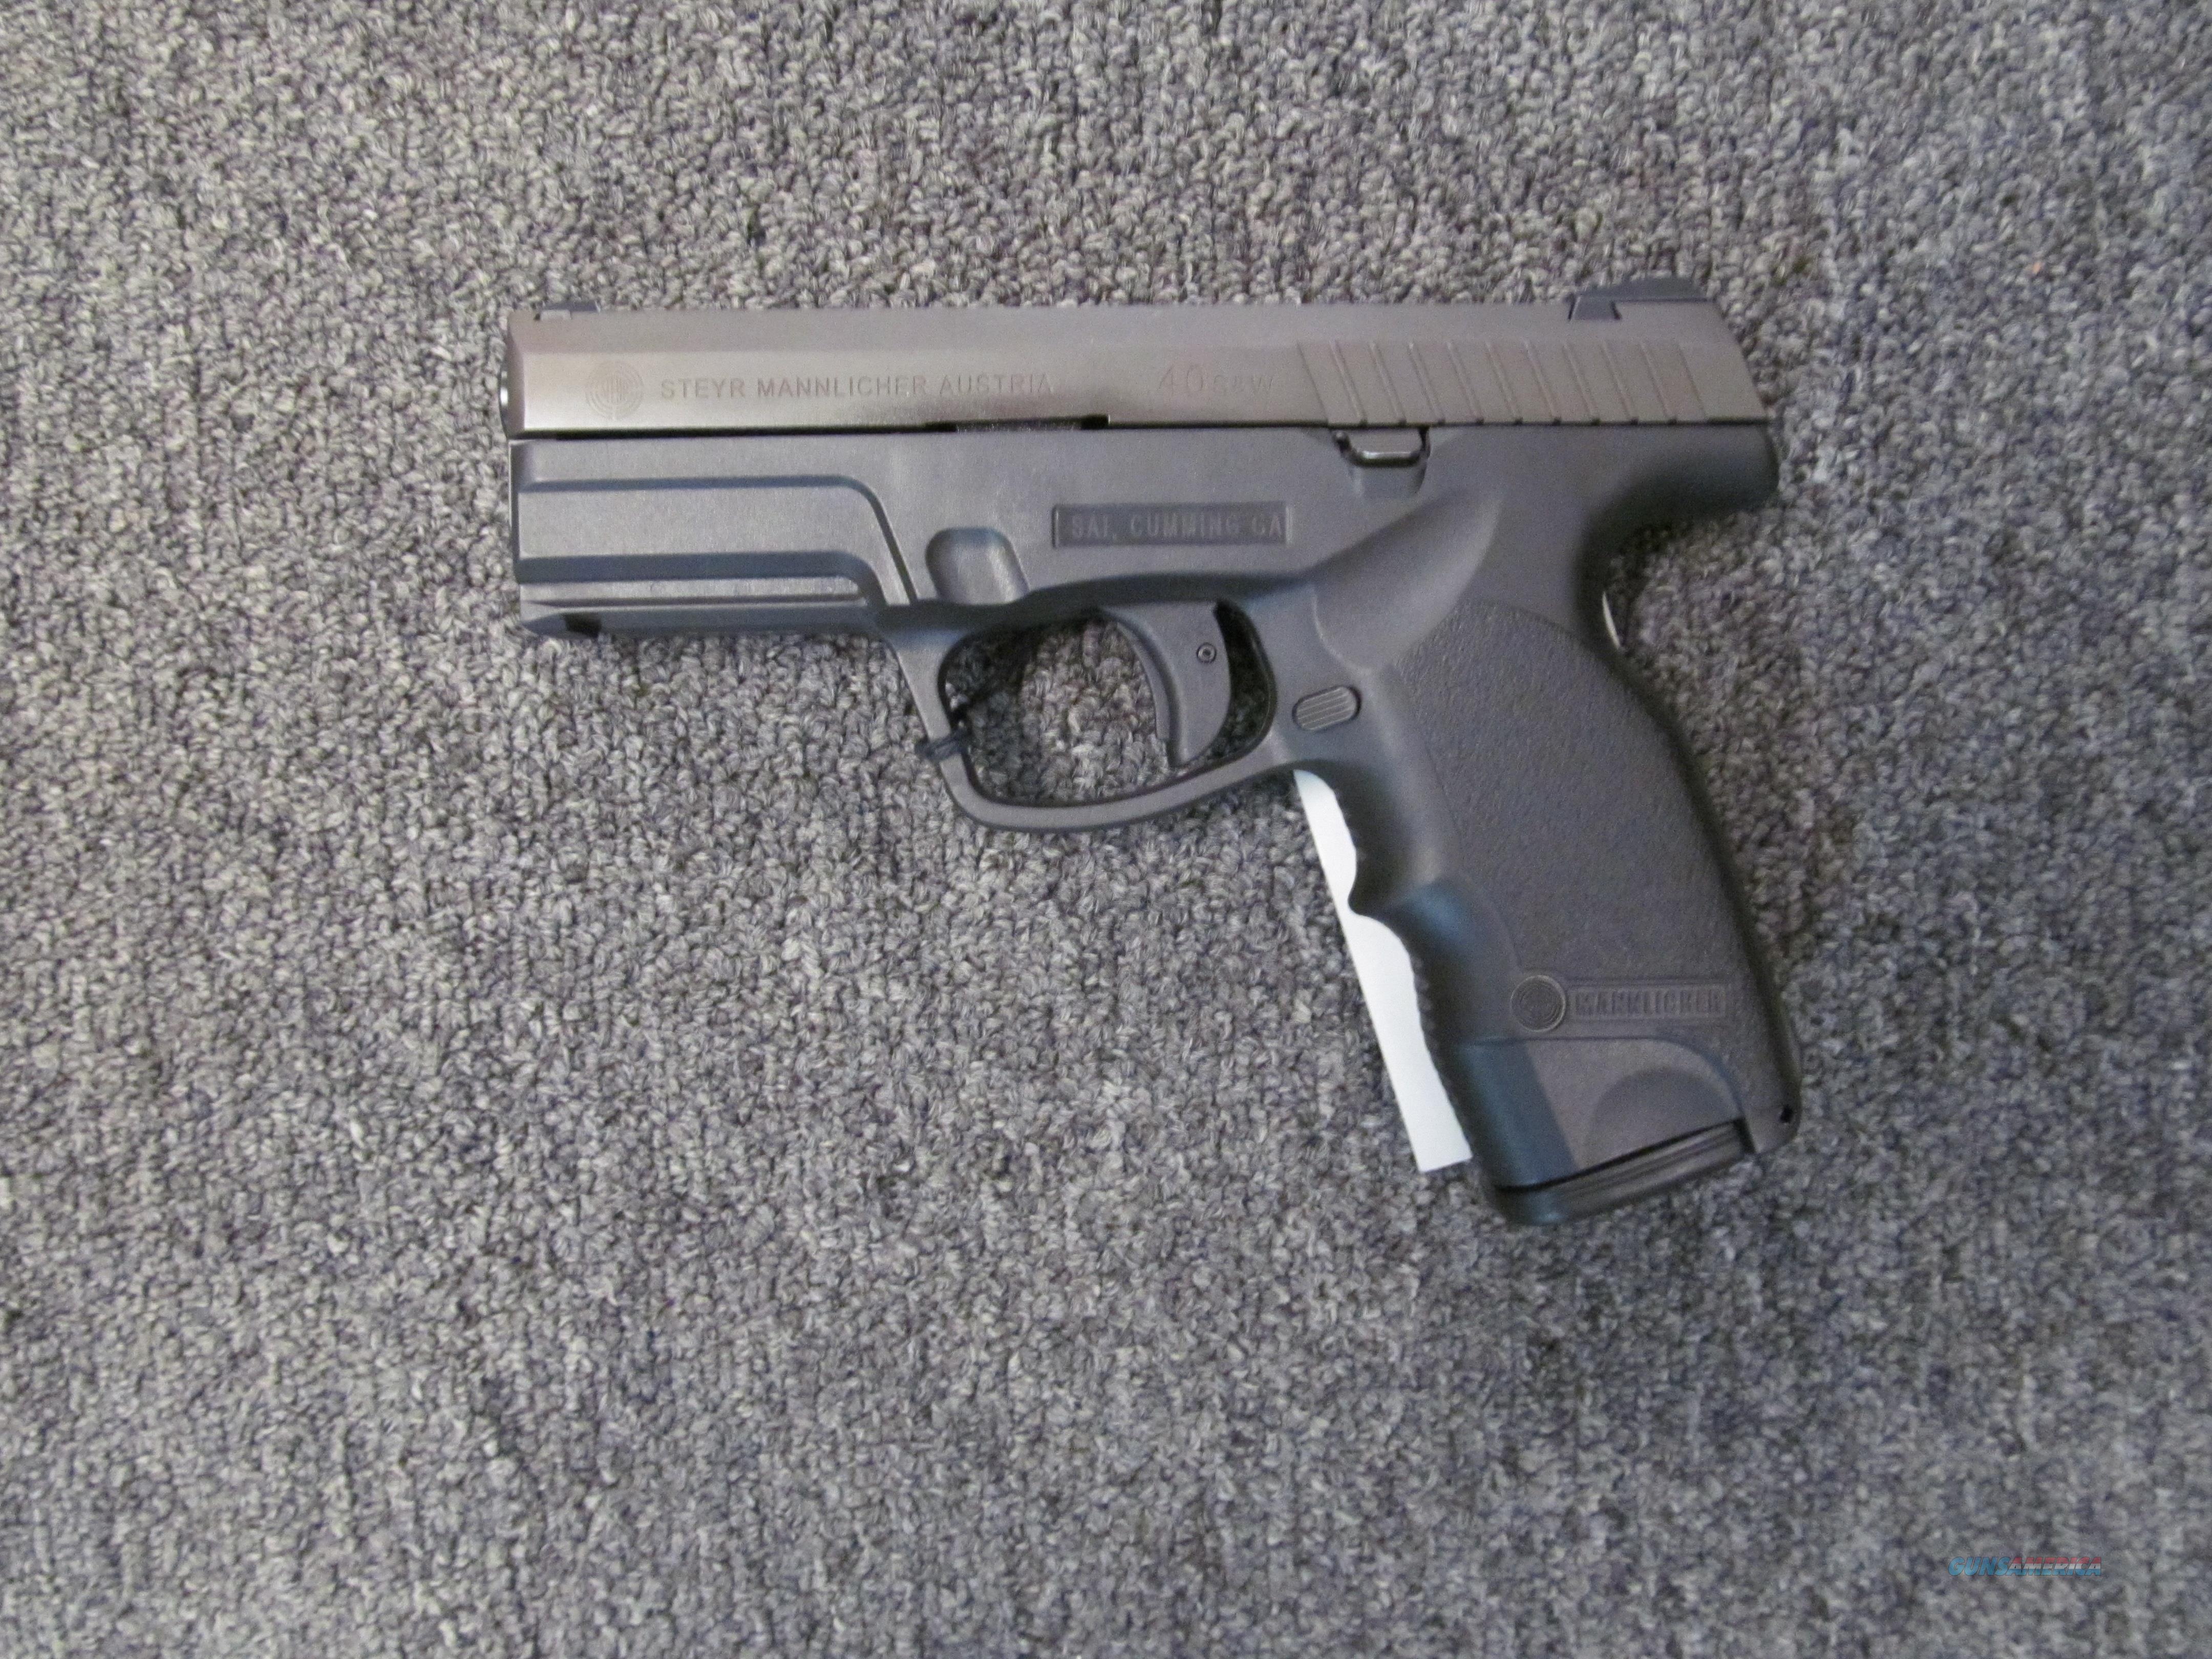 Steyr M9 A1 Type Semi Automatic Pistol Place - Frank Electronics